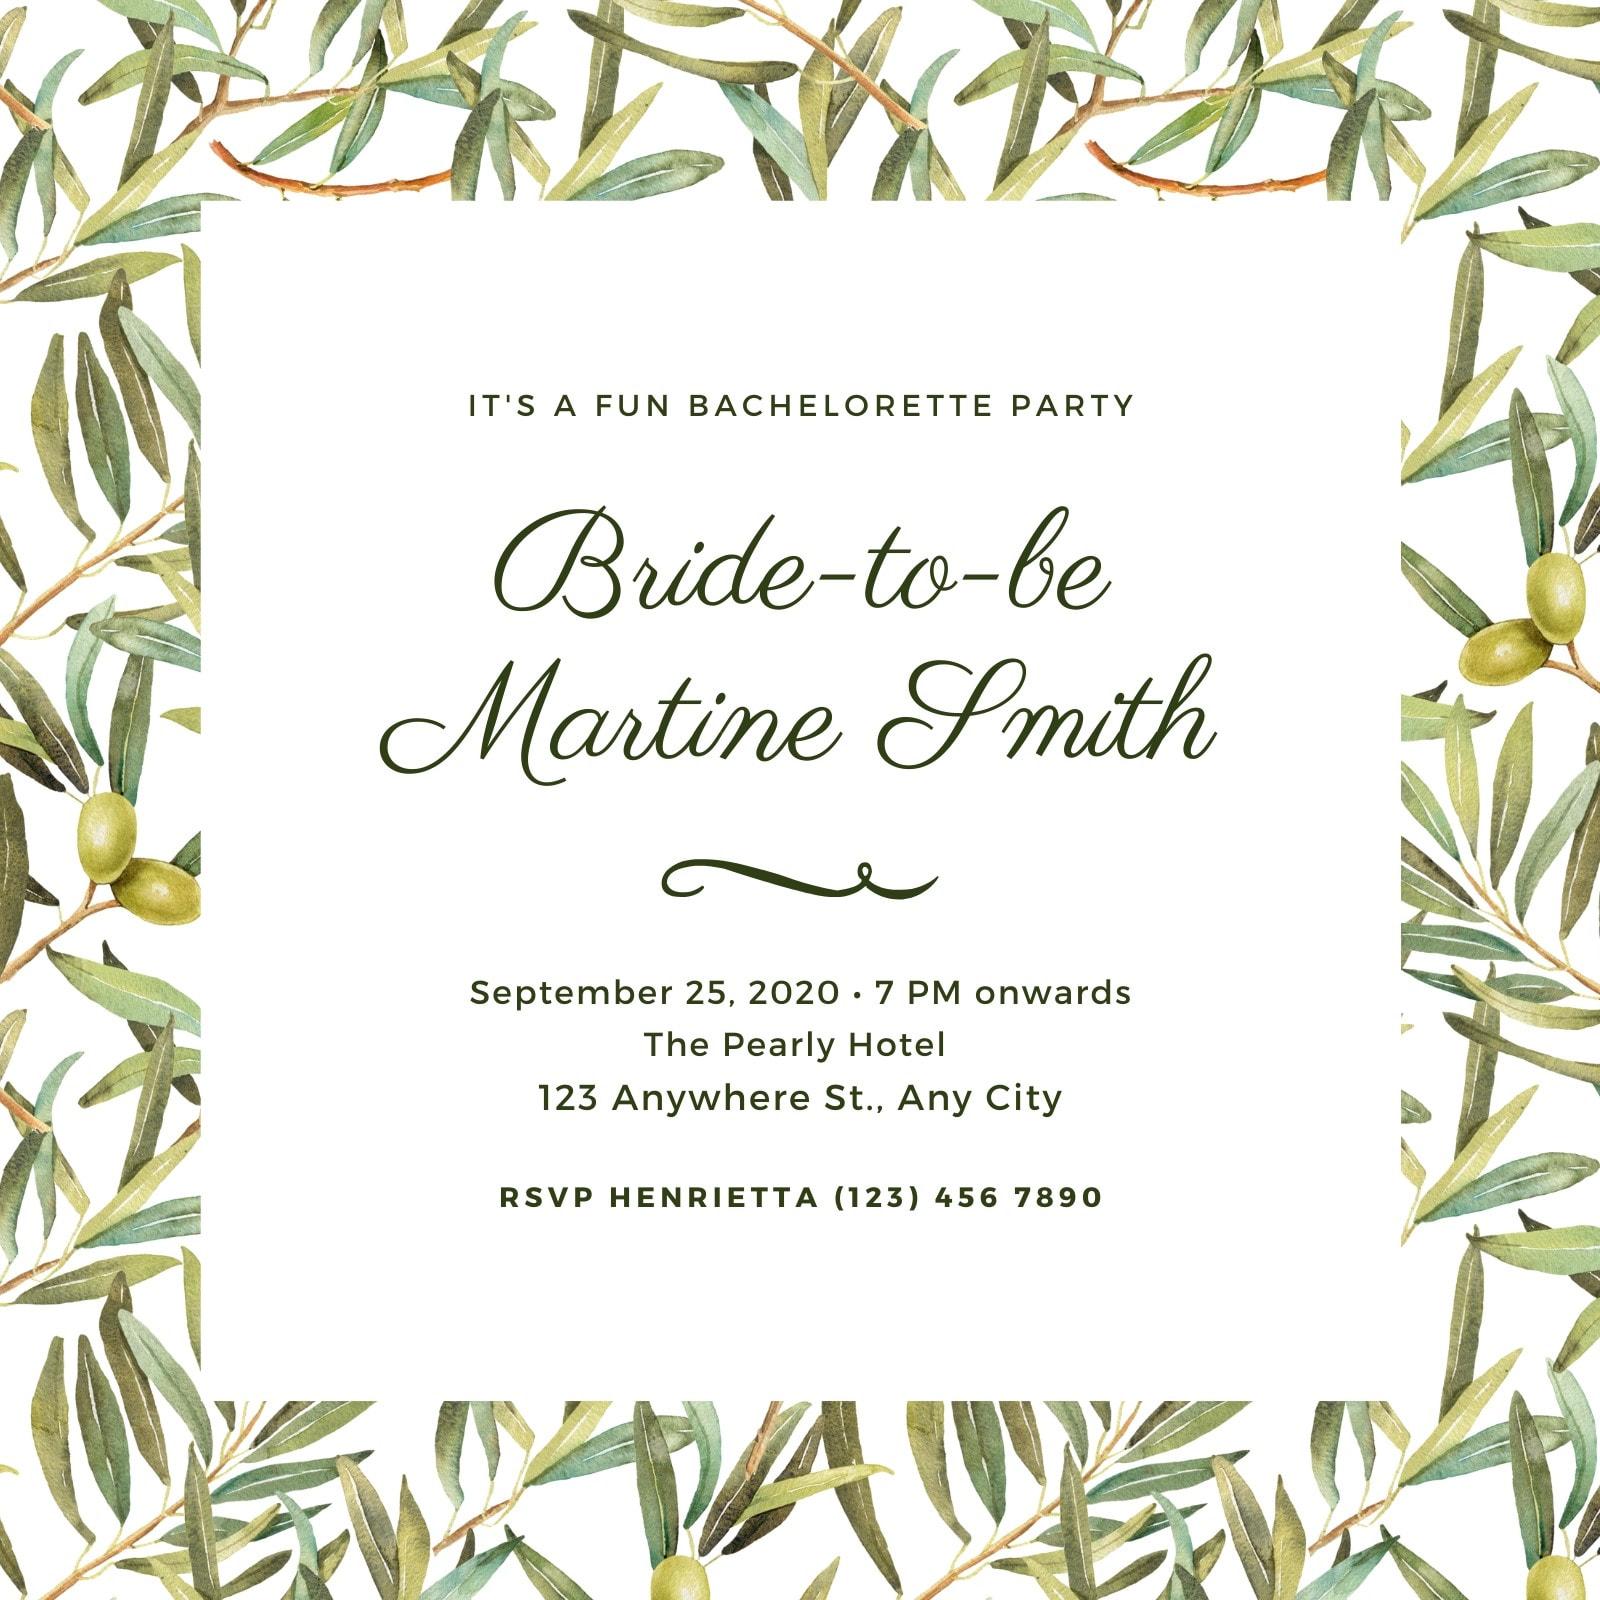 White and Green Foliage Bachelorette Invitation